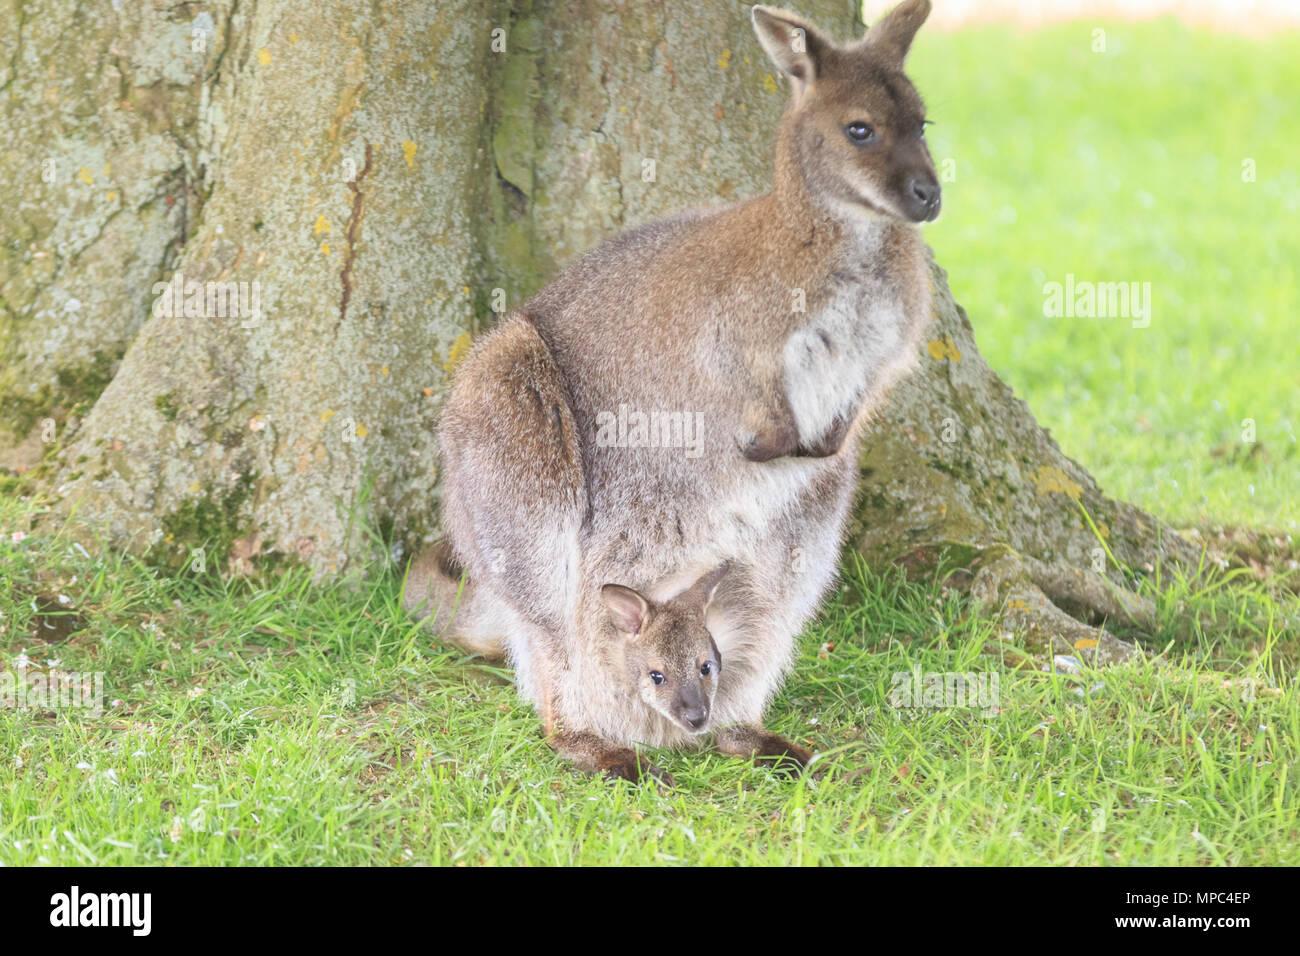 Kangaroo Joey In Zoo Animal Pouch Stock Photos & Kangaroo